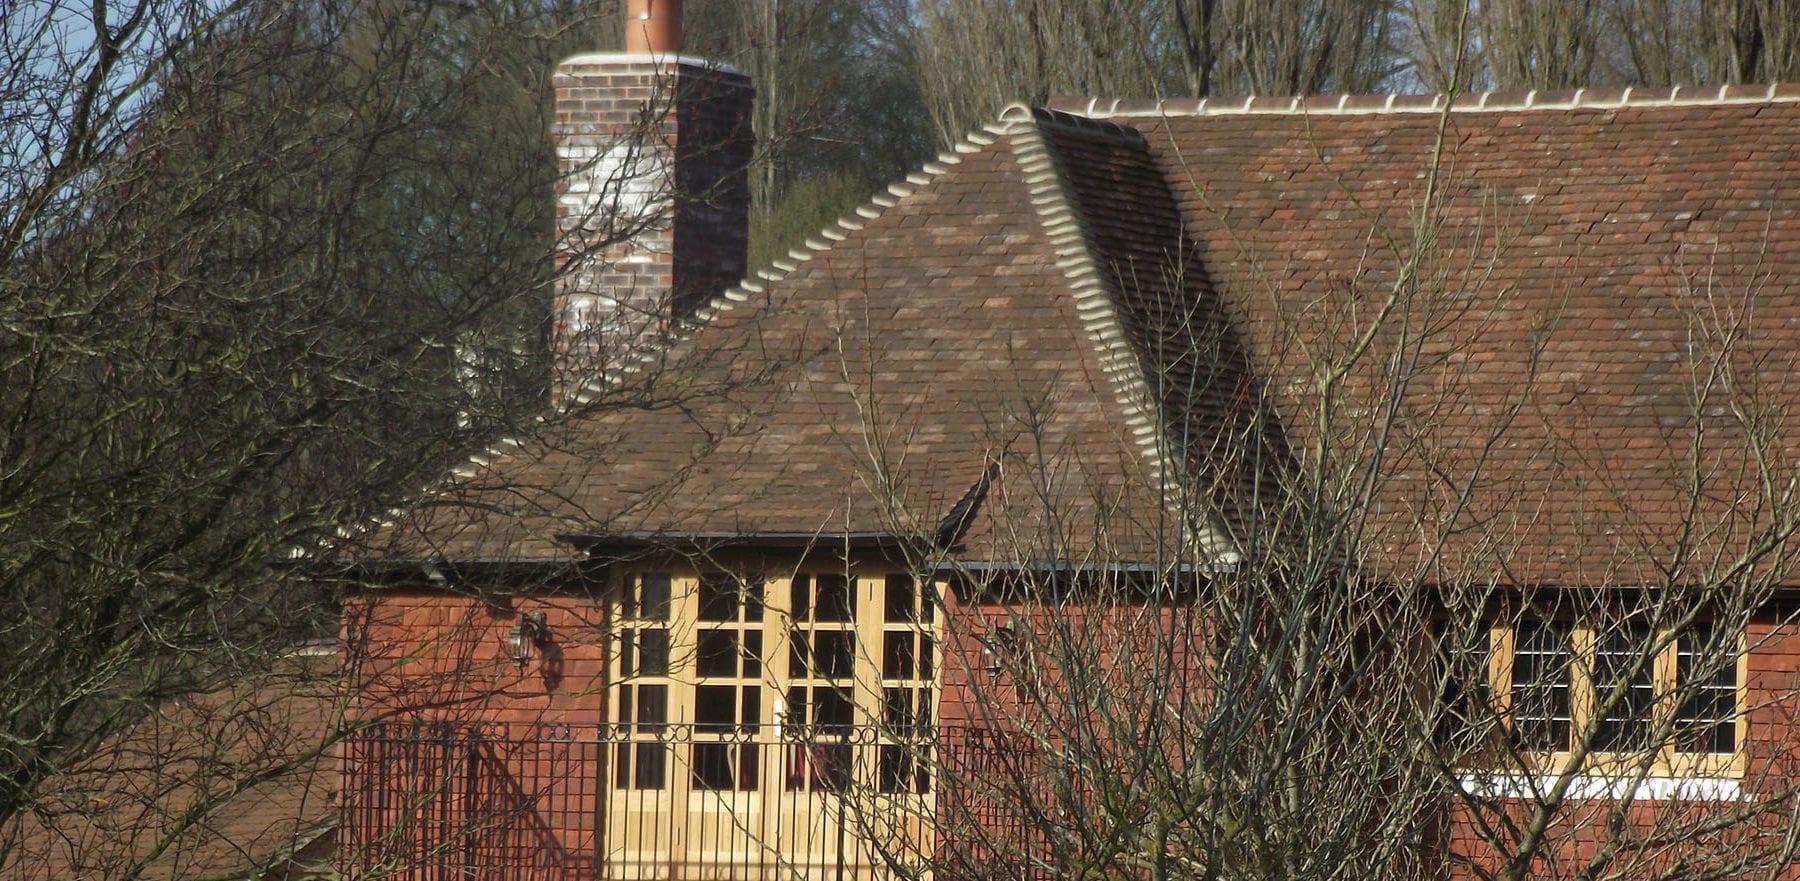 Lifestiles - Handmade Restoration Clay Roof Tiles - Seale, England 2